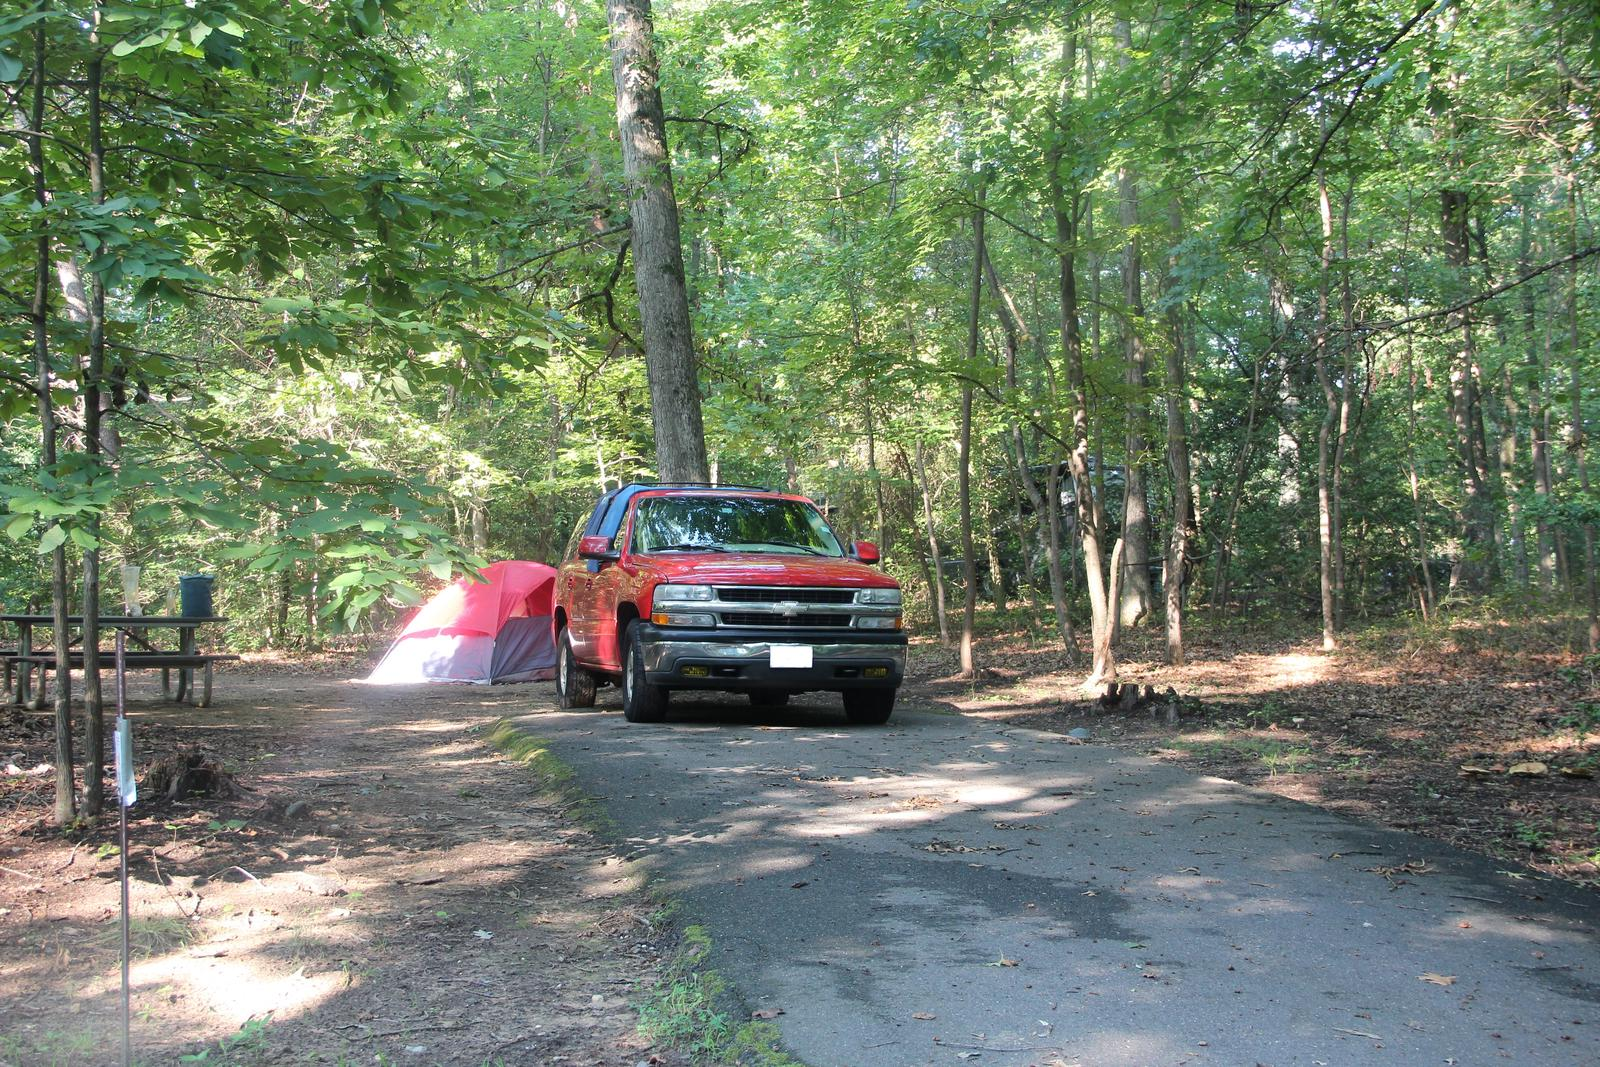 Greenbelt Park Campground D Loop Site 116